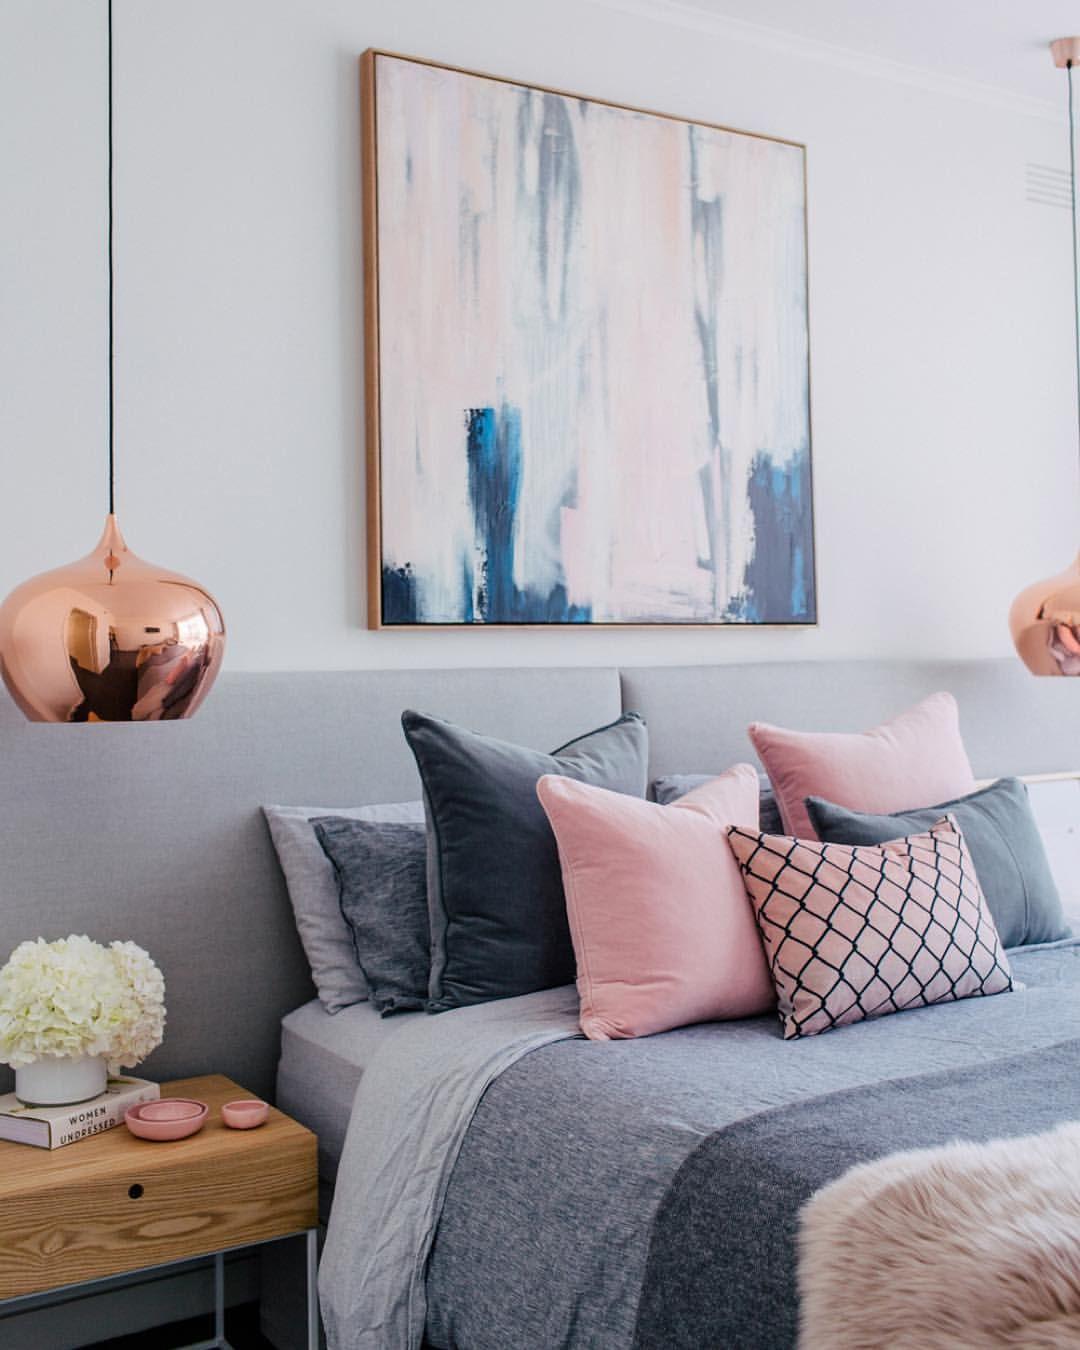 Master bedroom art above bed  Pin by Sharon Nertney on Bedroom Design  Pinterest  Bed heads